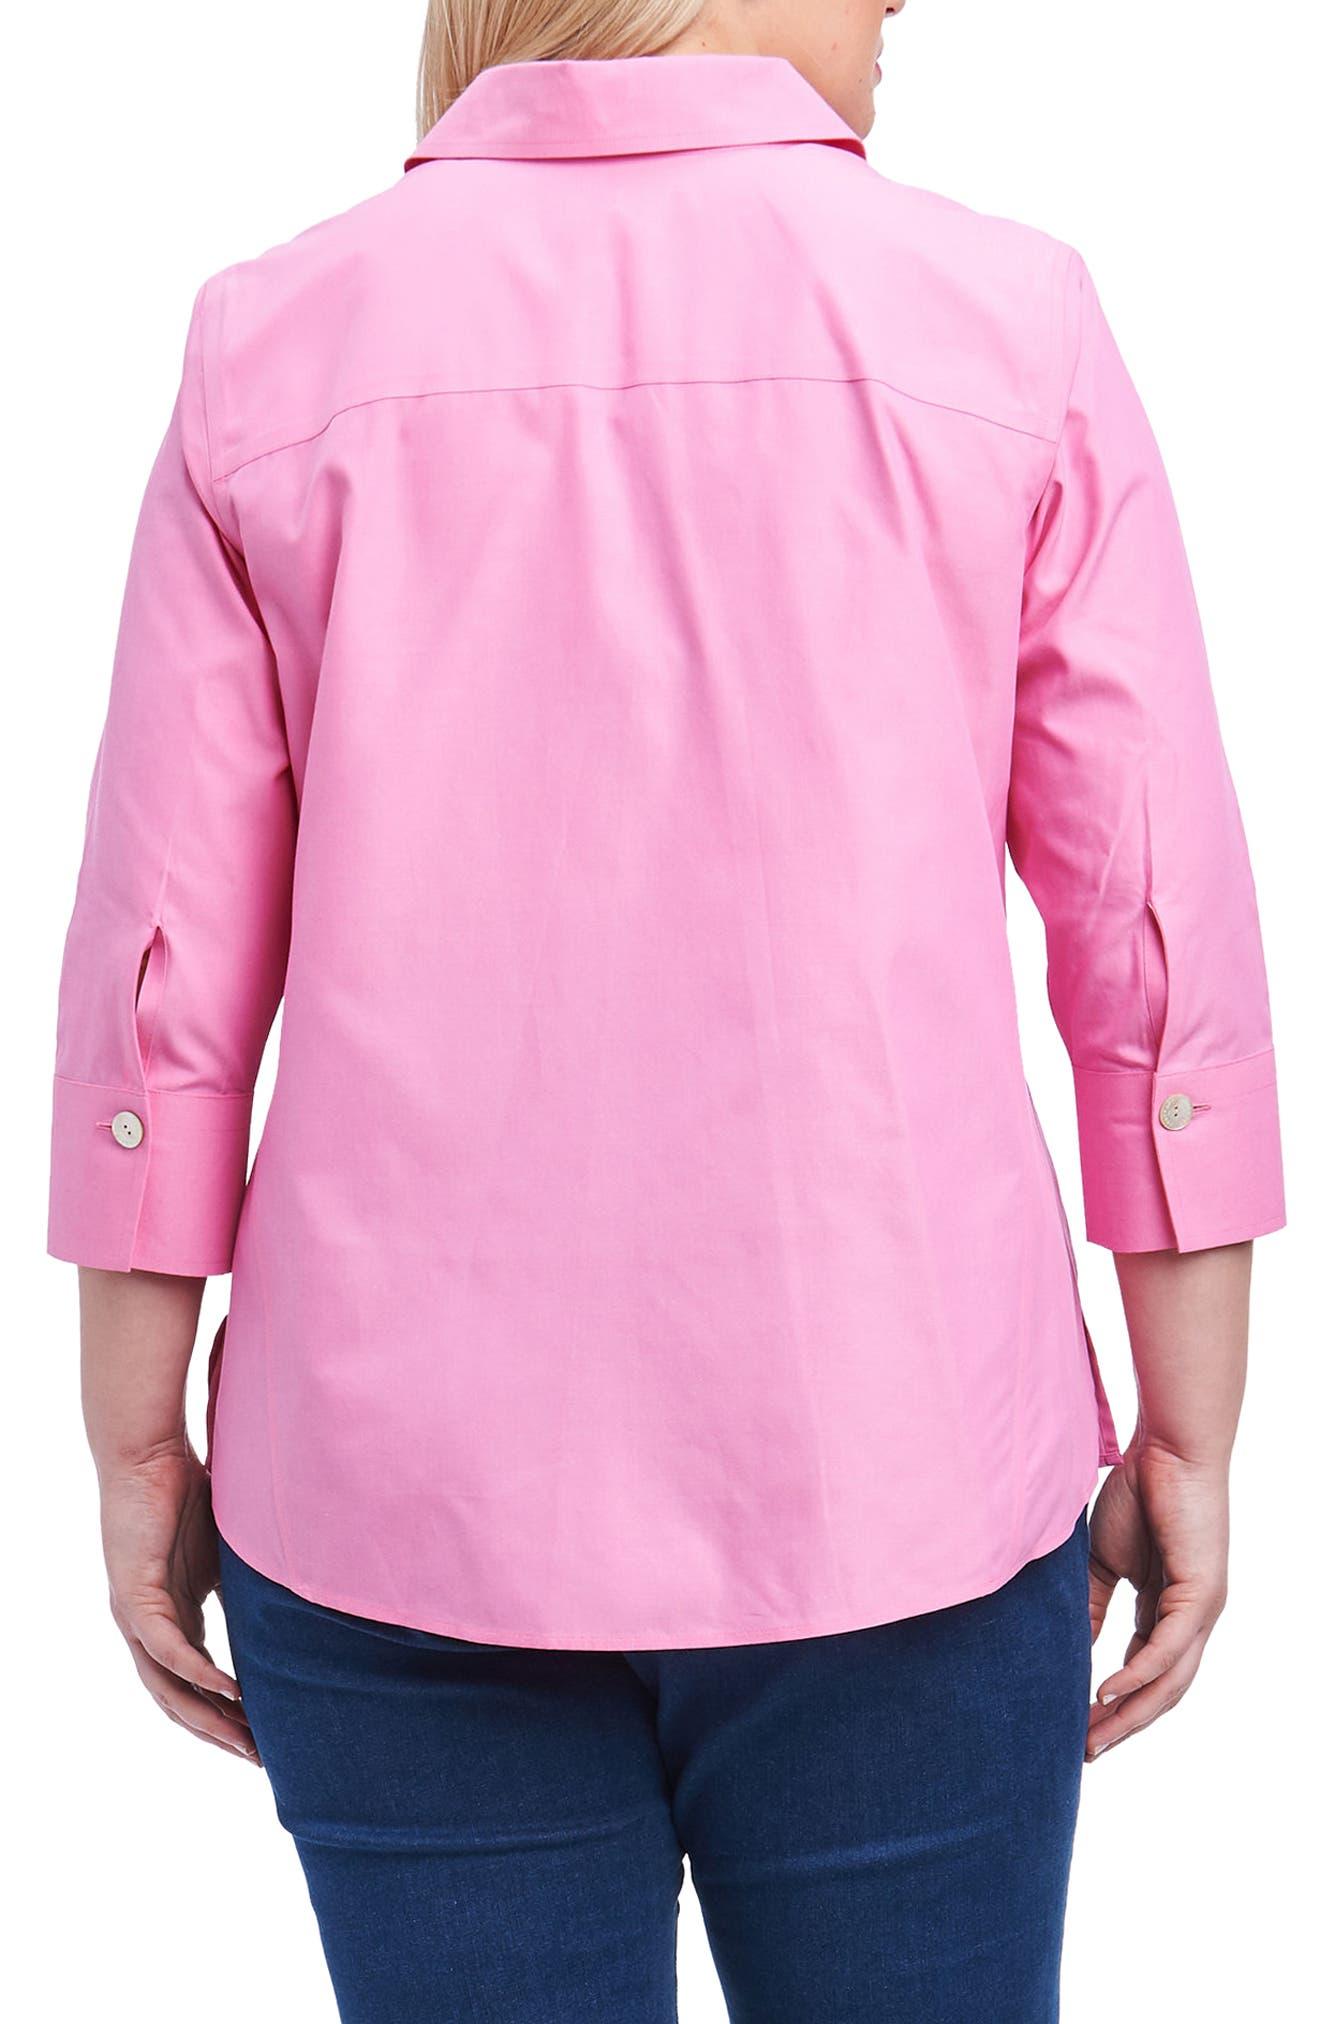 Alternate Image 2  - Foxcroft 'Paige' Non-Iron Cotton Shirt (Plus Size)